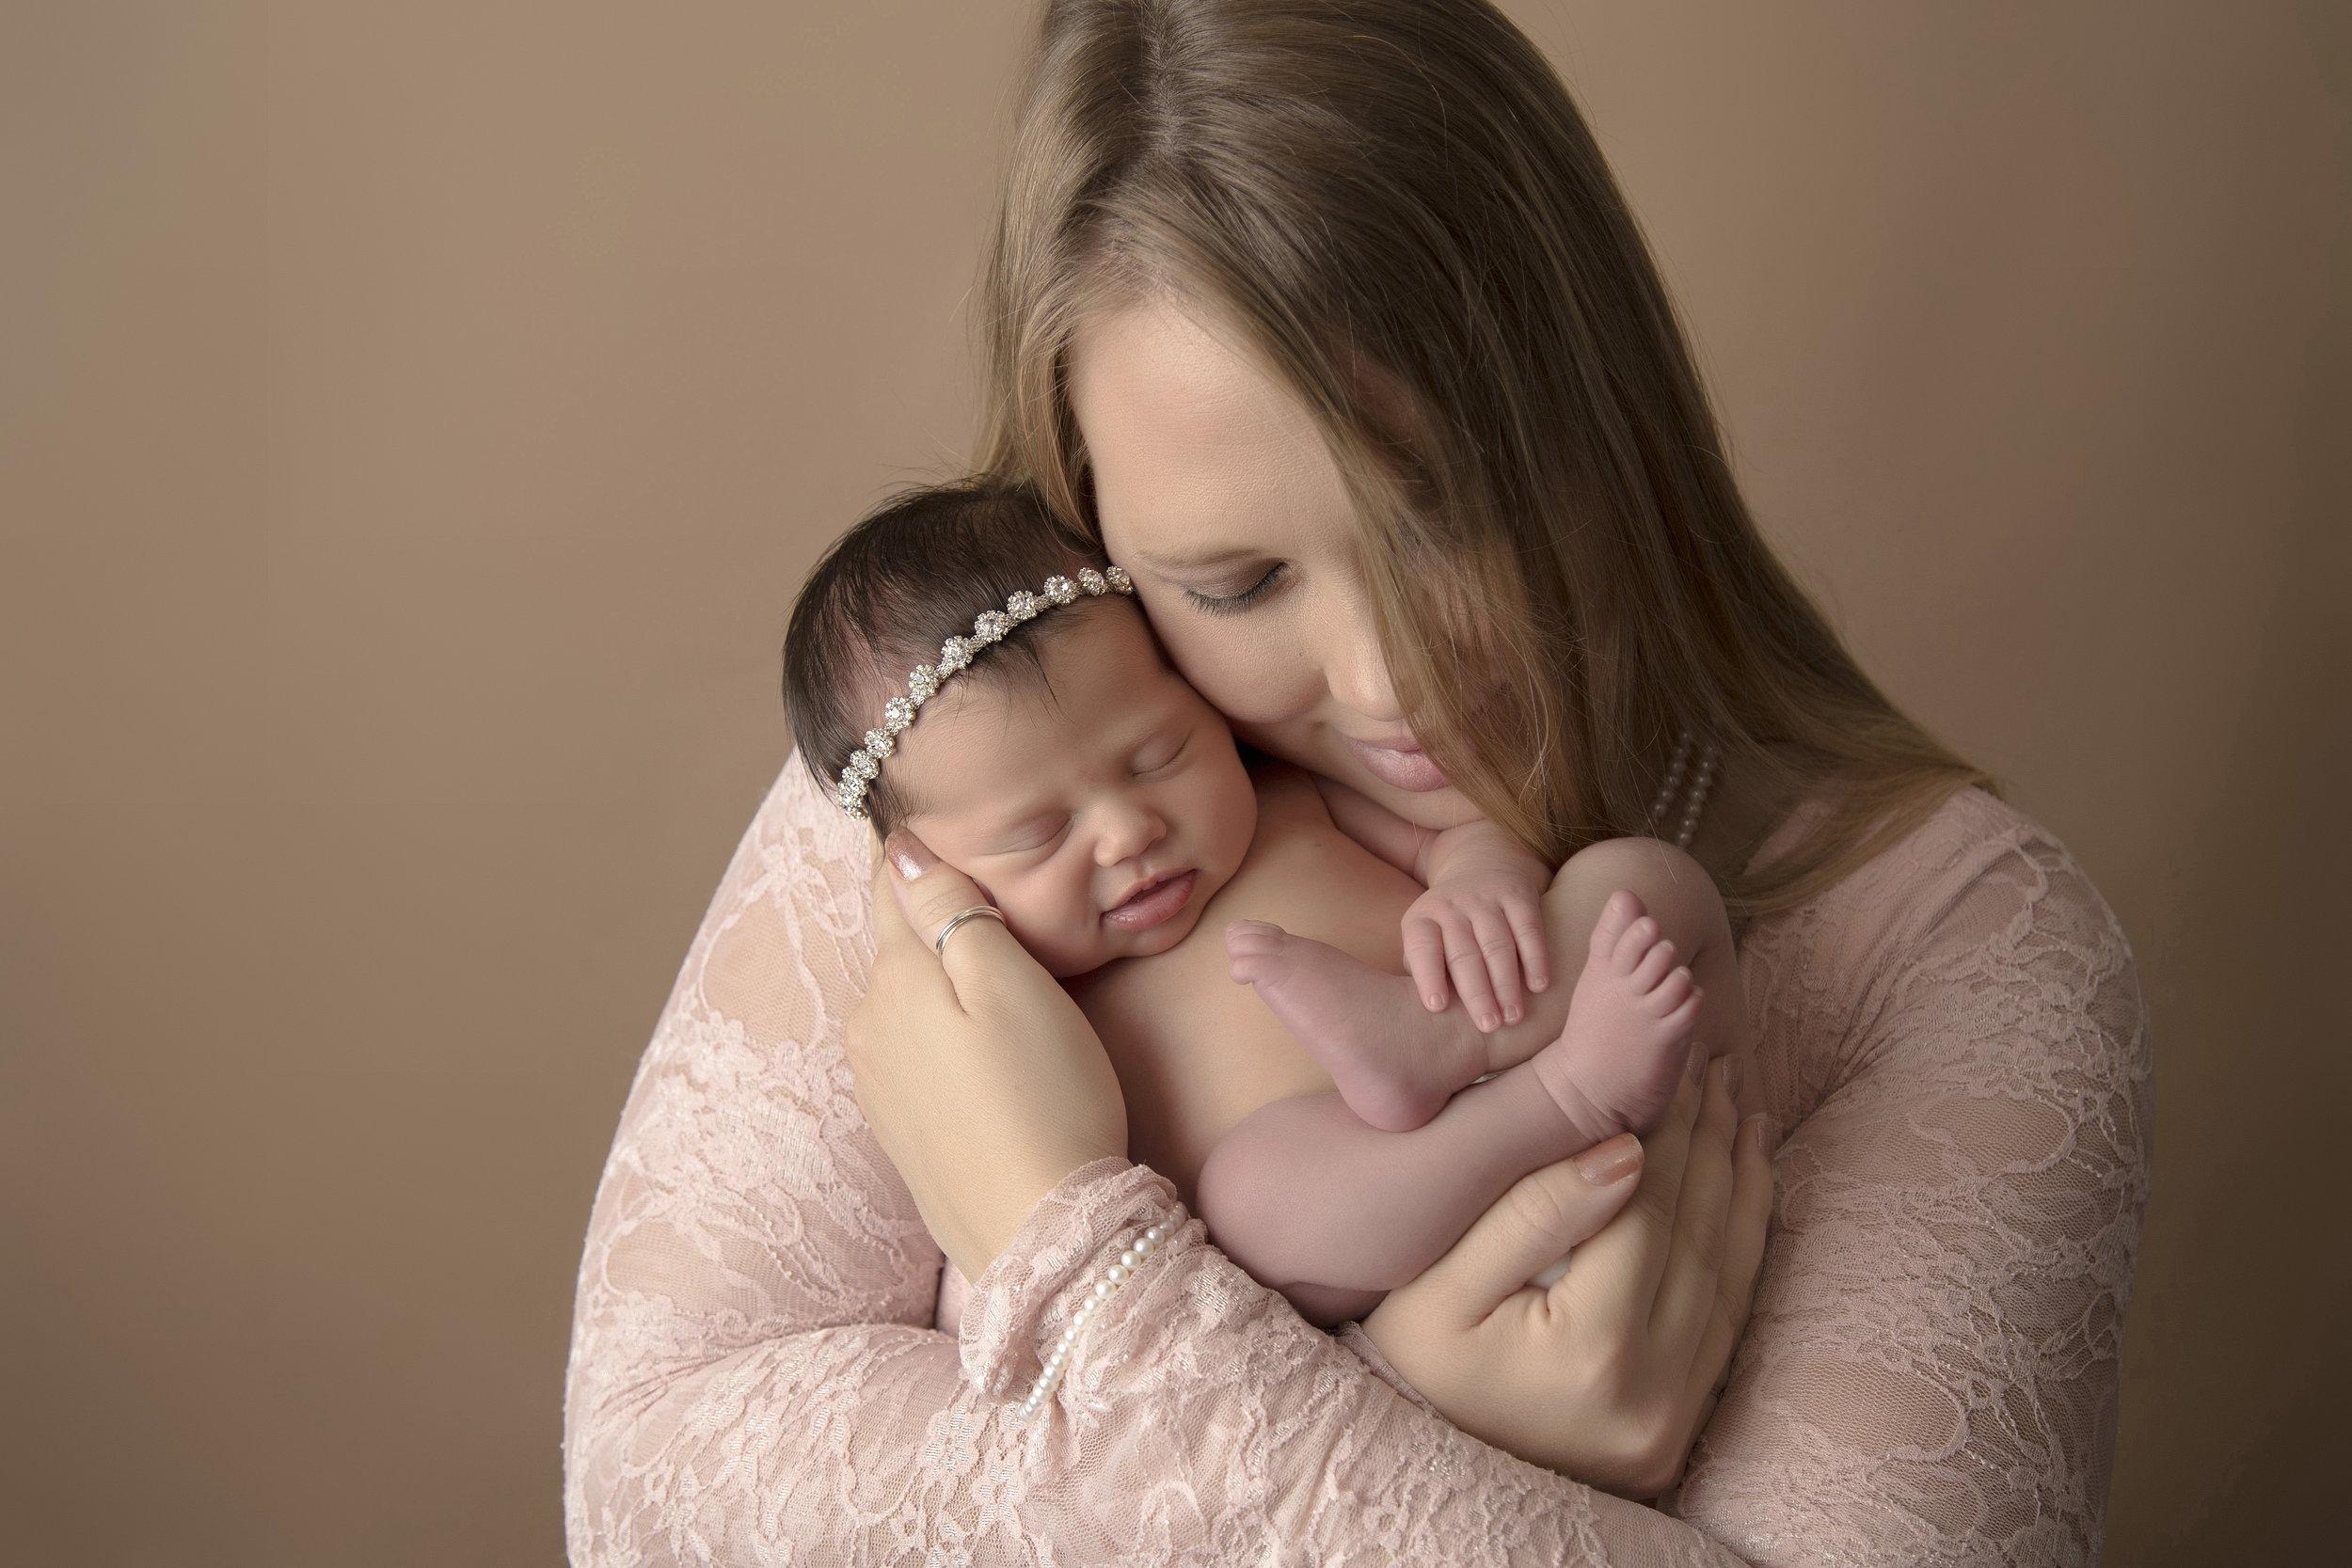 lancaster-newborn-photography-angie-englerth-aep028.jpg